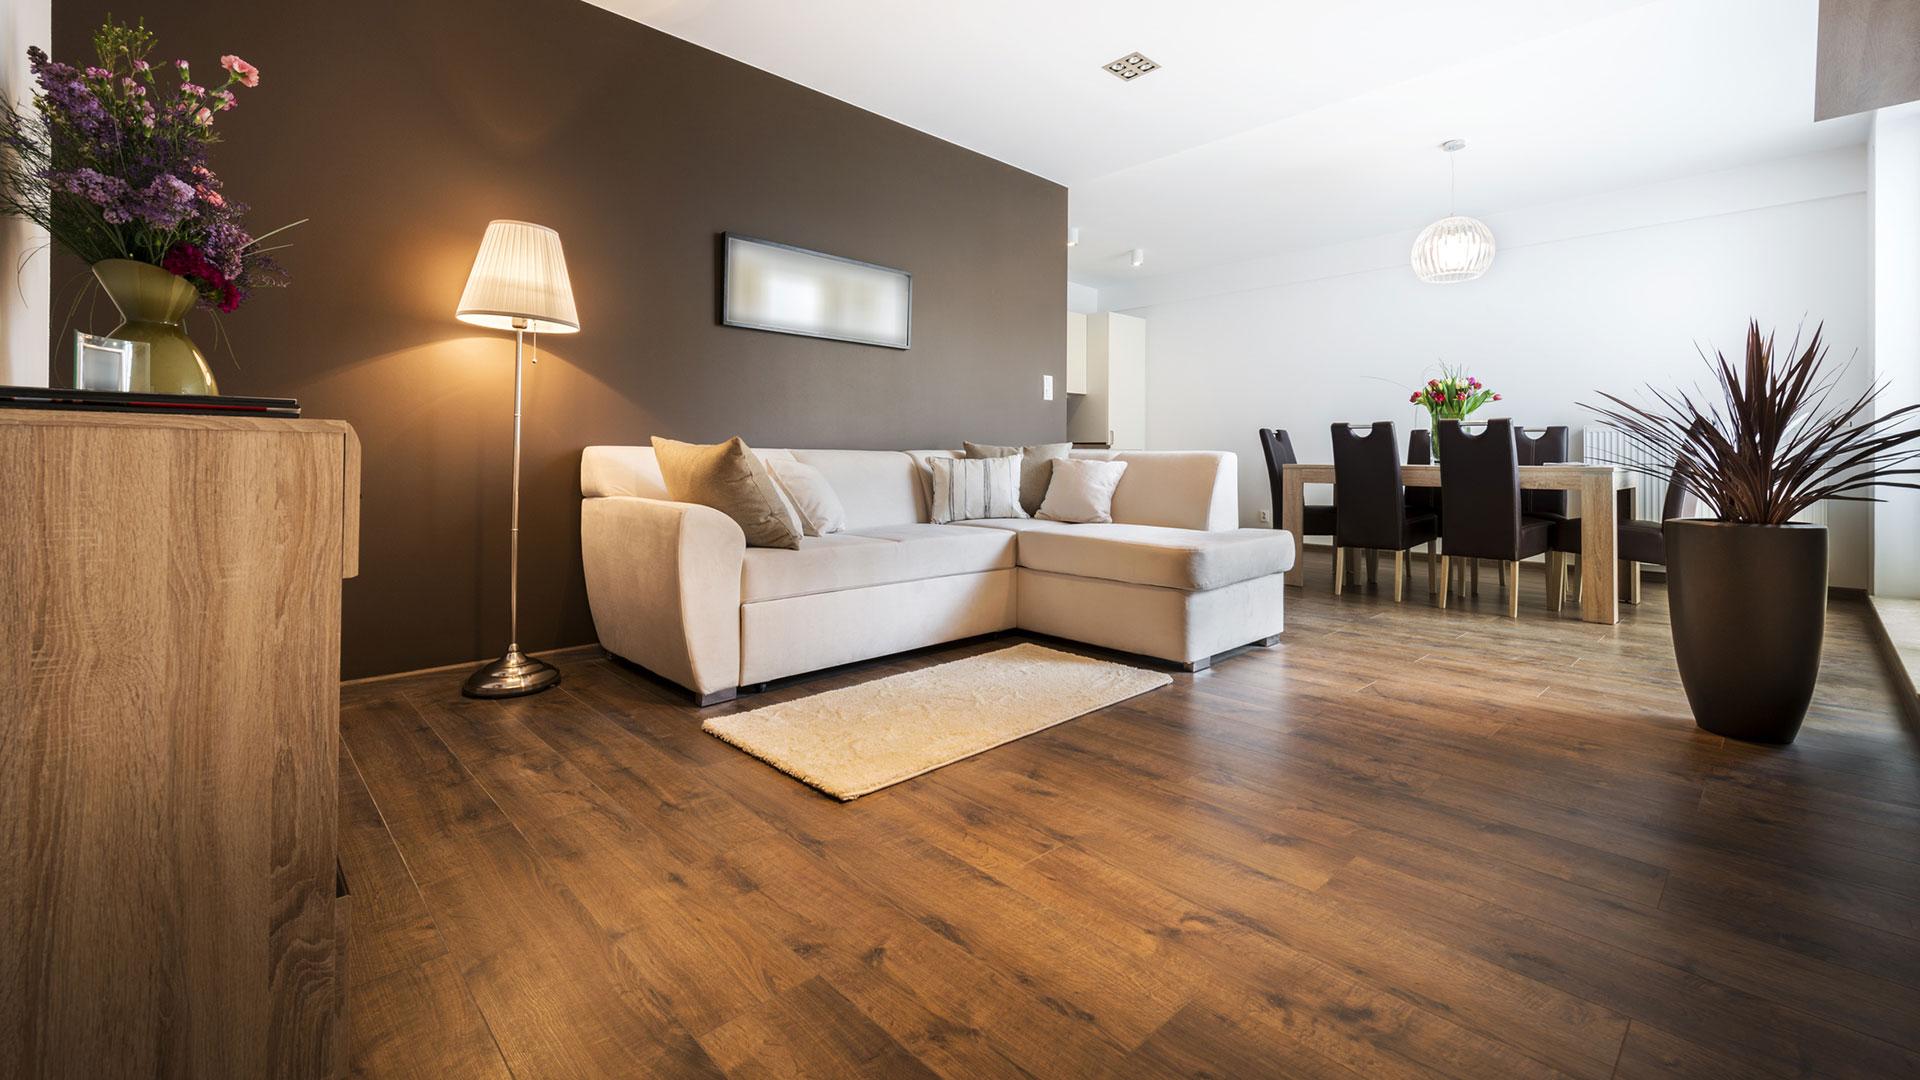 hera raumdesign ihr kompetenter partner f r bodenbel ge aller art. Black Bedroom Furniture Sets. Home Design Ideas